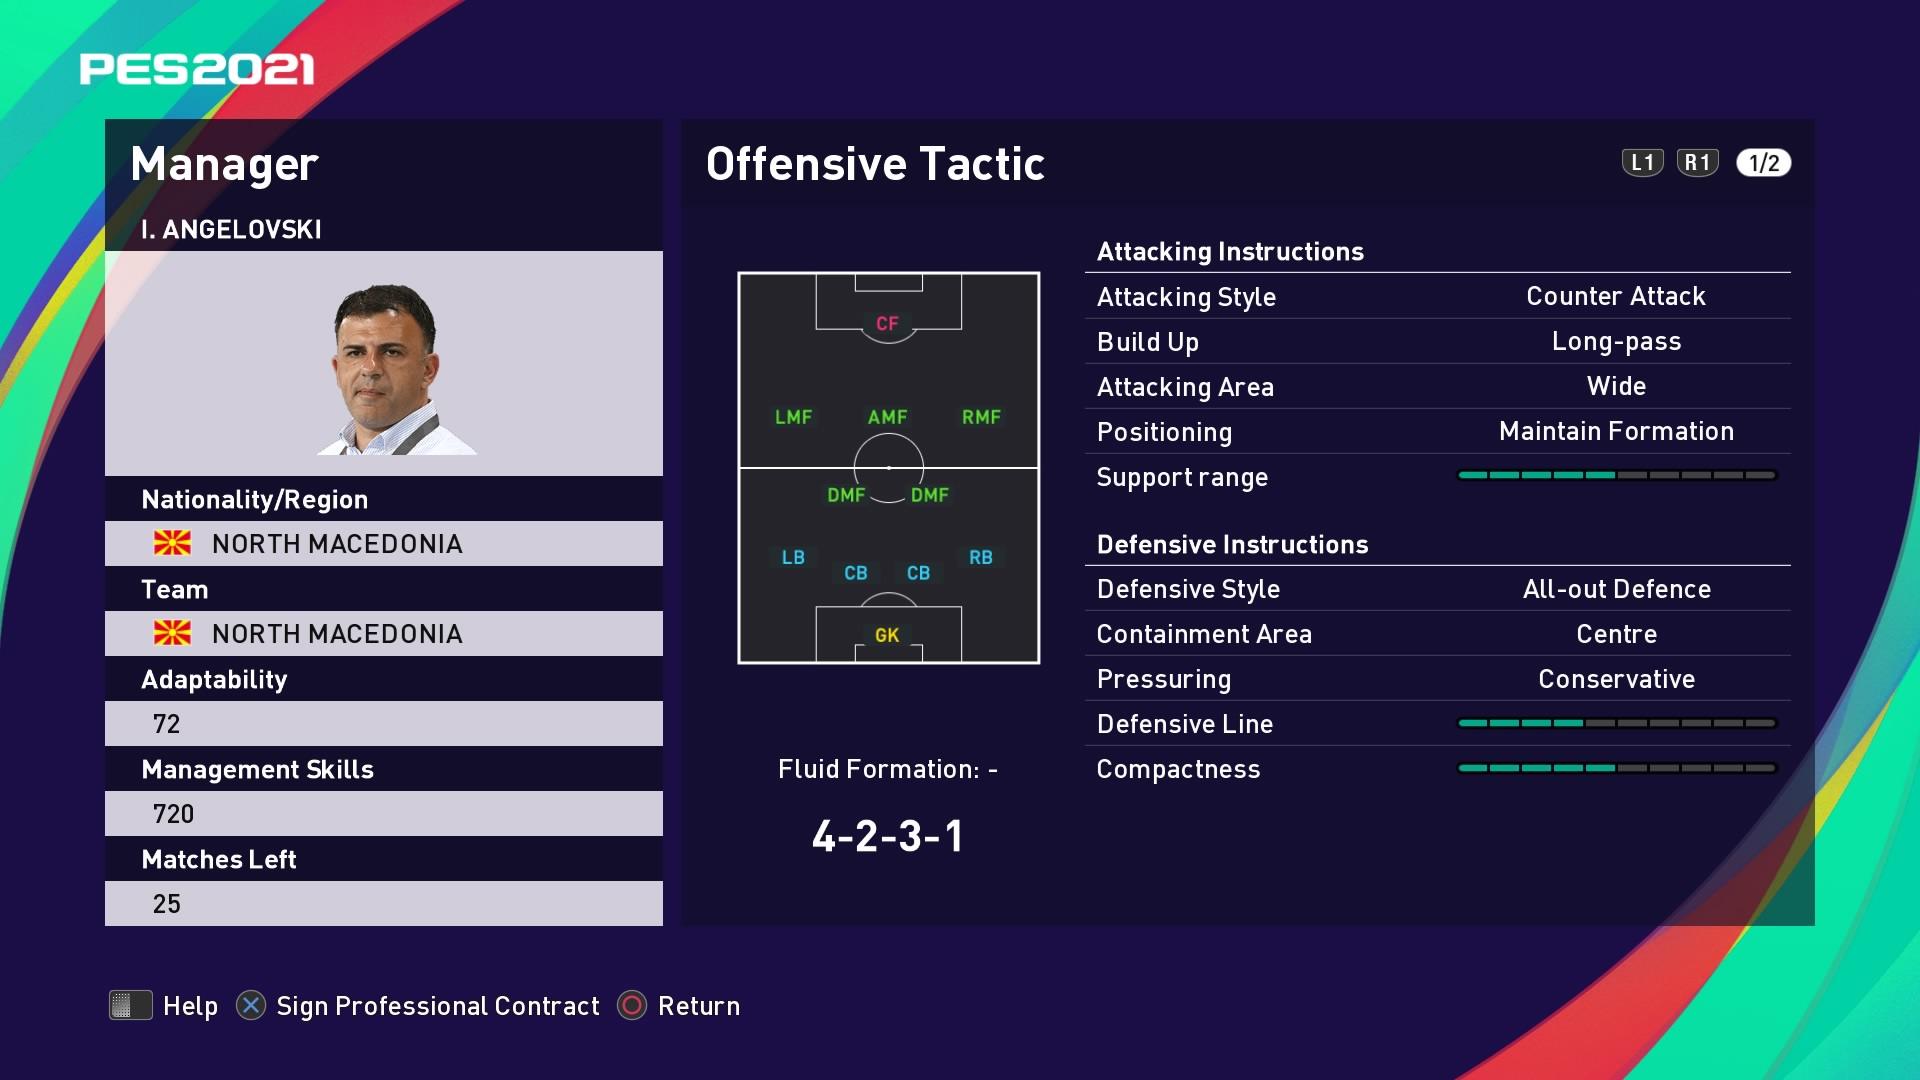 I. Angelovski (Igor Angelovski) Offensive Tactic in PES 2021 myClub